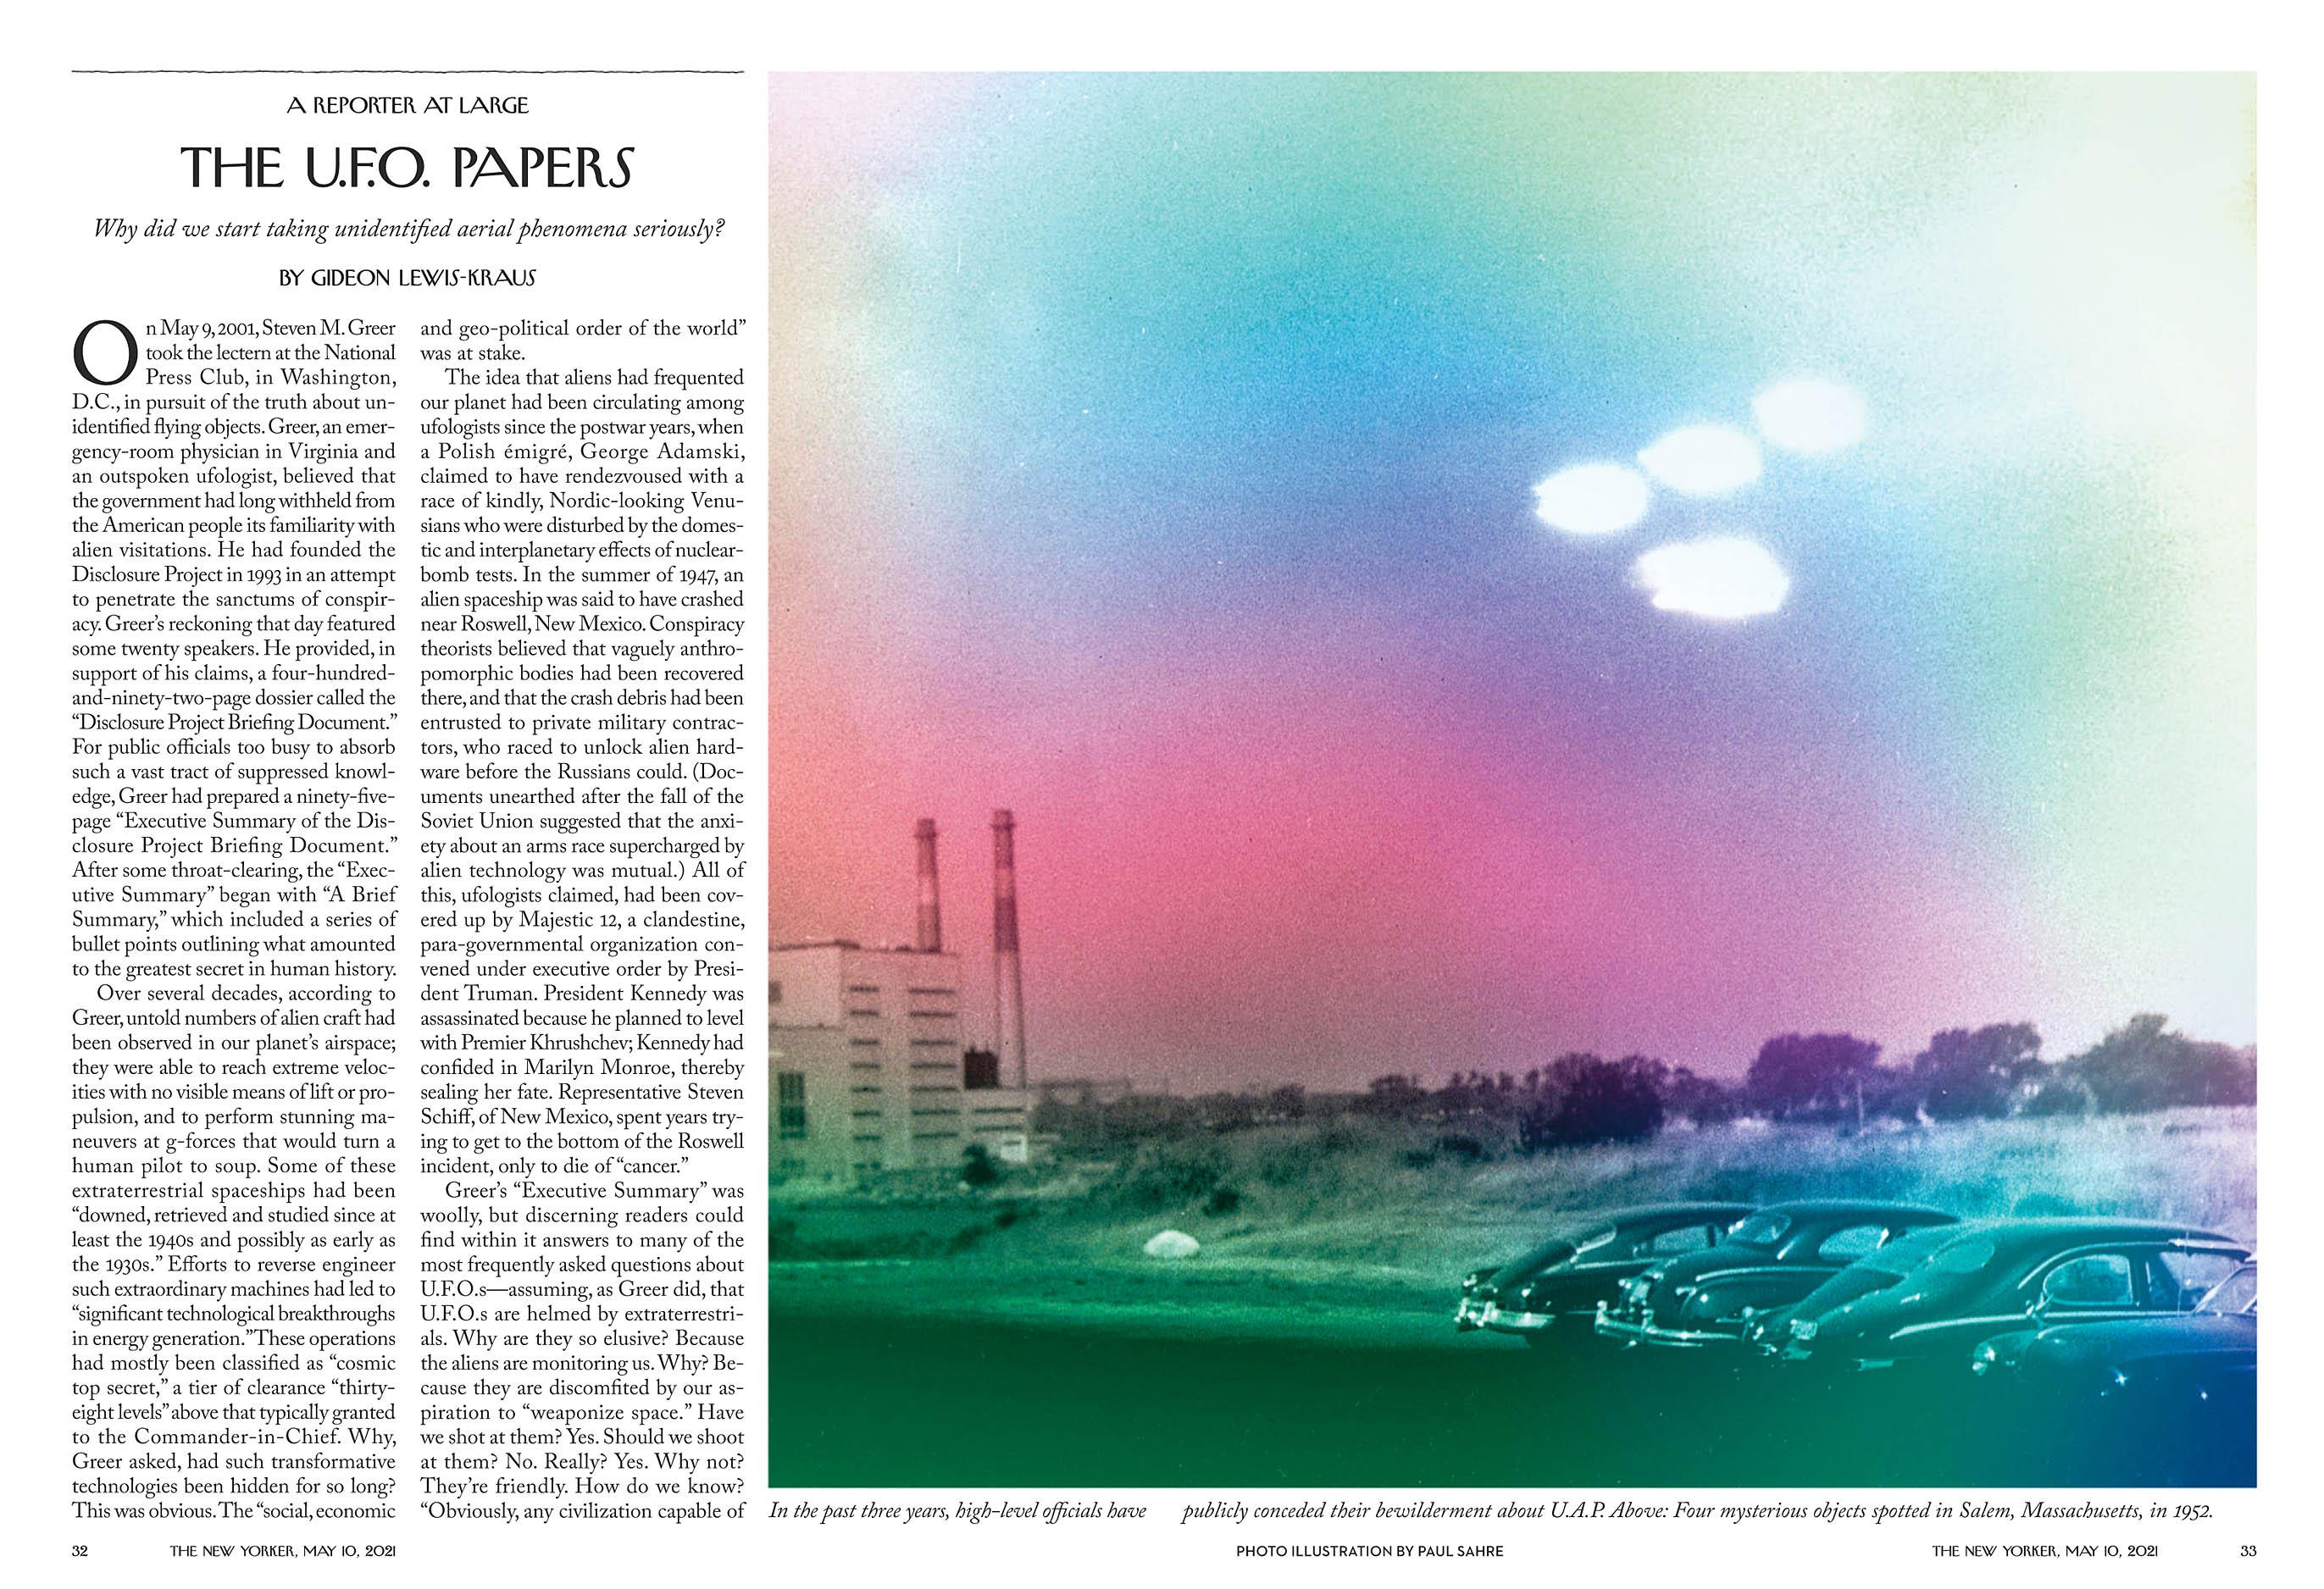 New Yorker 210510 UFO 01.jpg